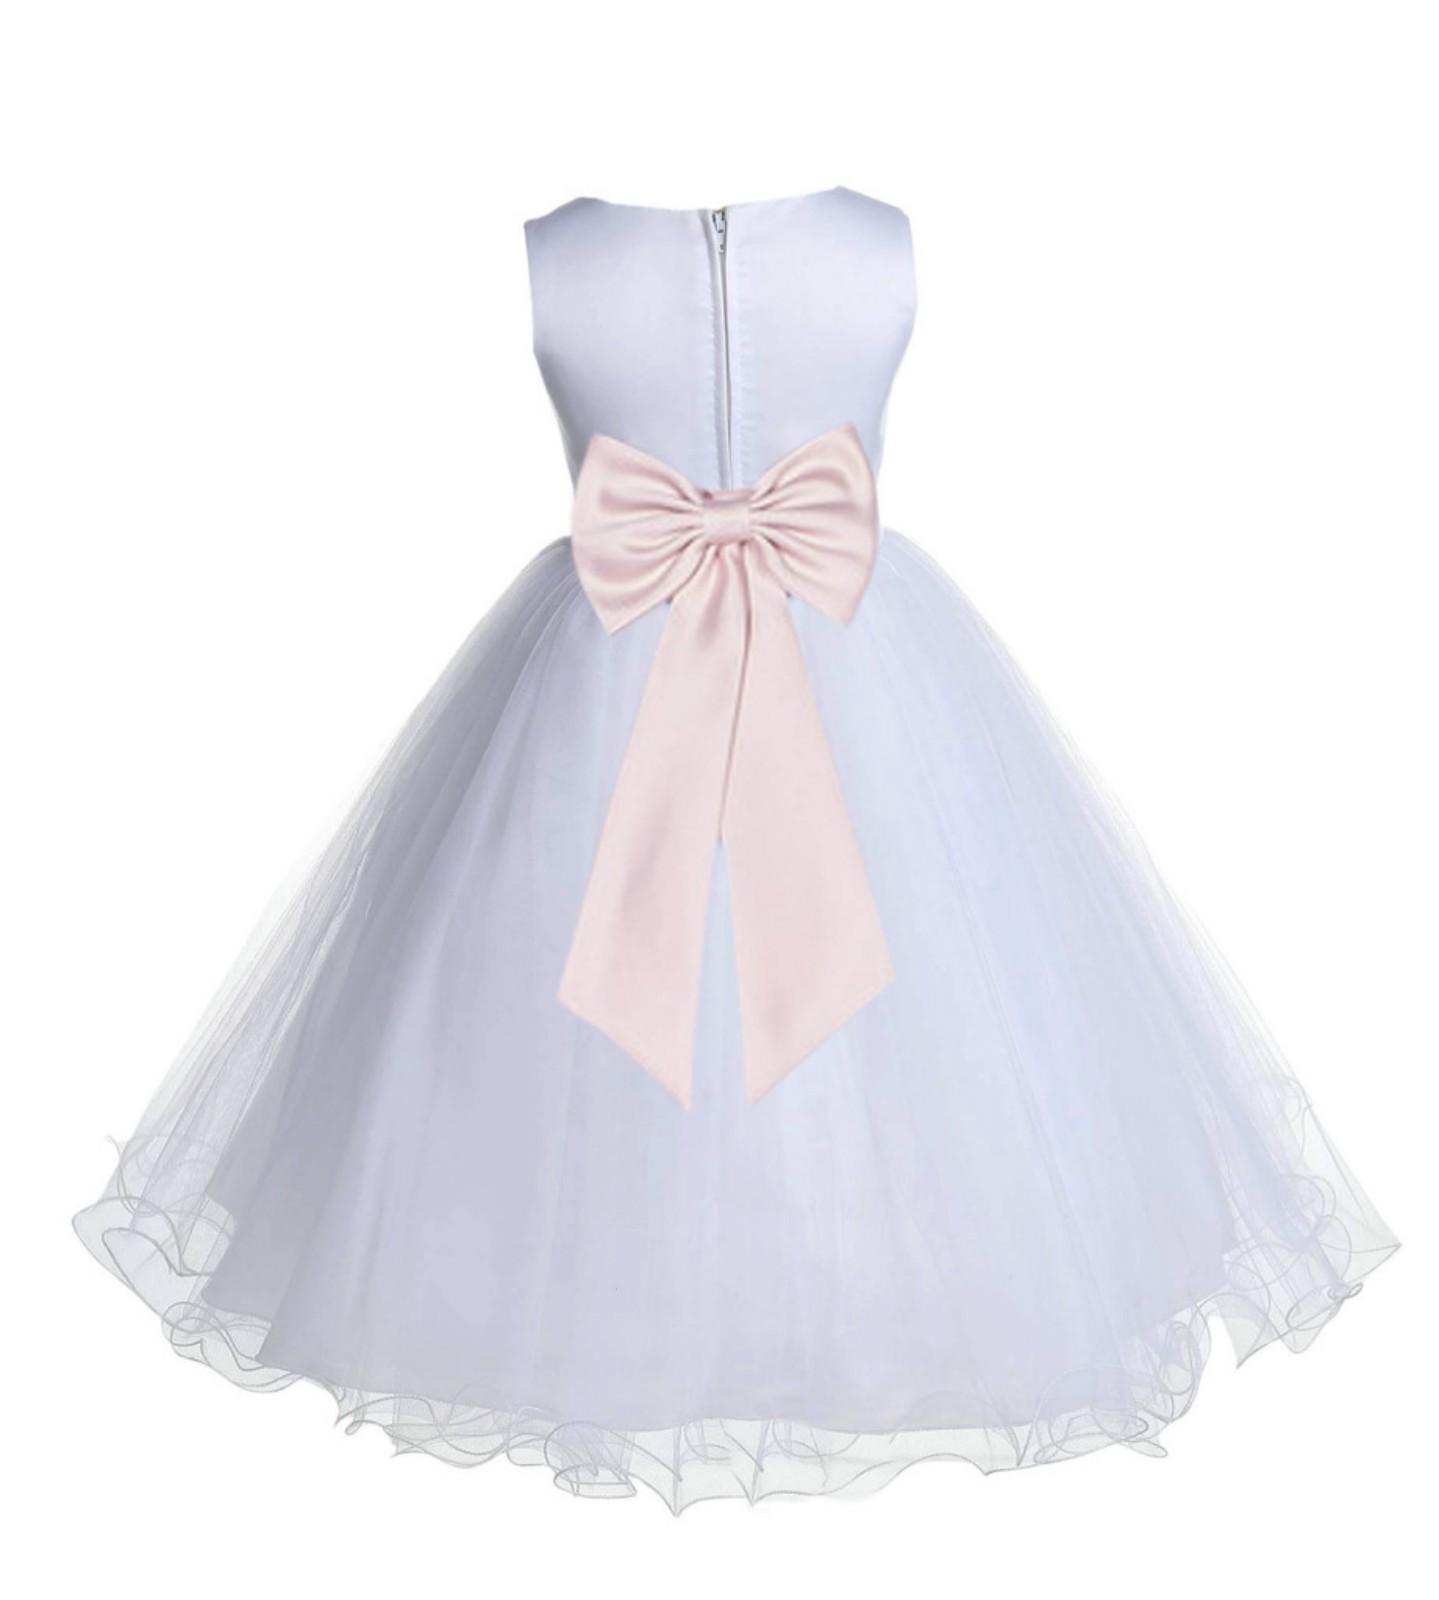 White/Blush Pink Tulle Rattail Edge Flower Girl Dress Wedding Bridesmaid 829T